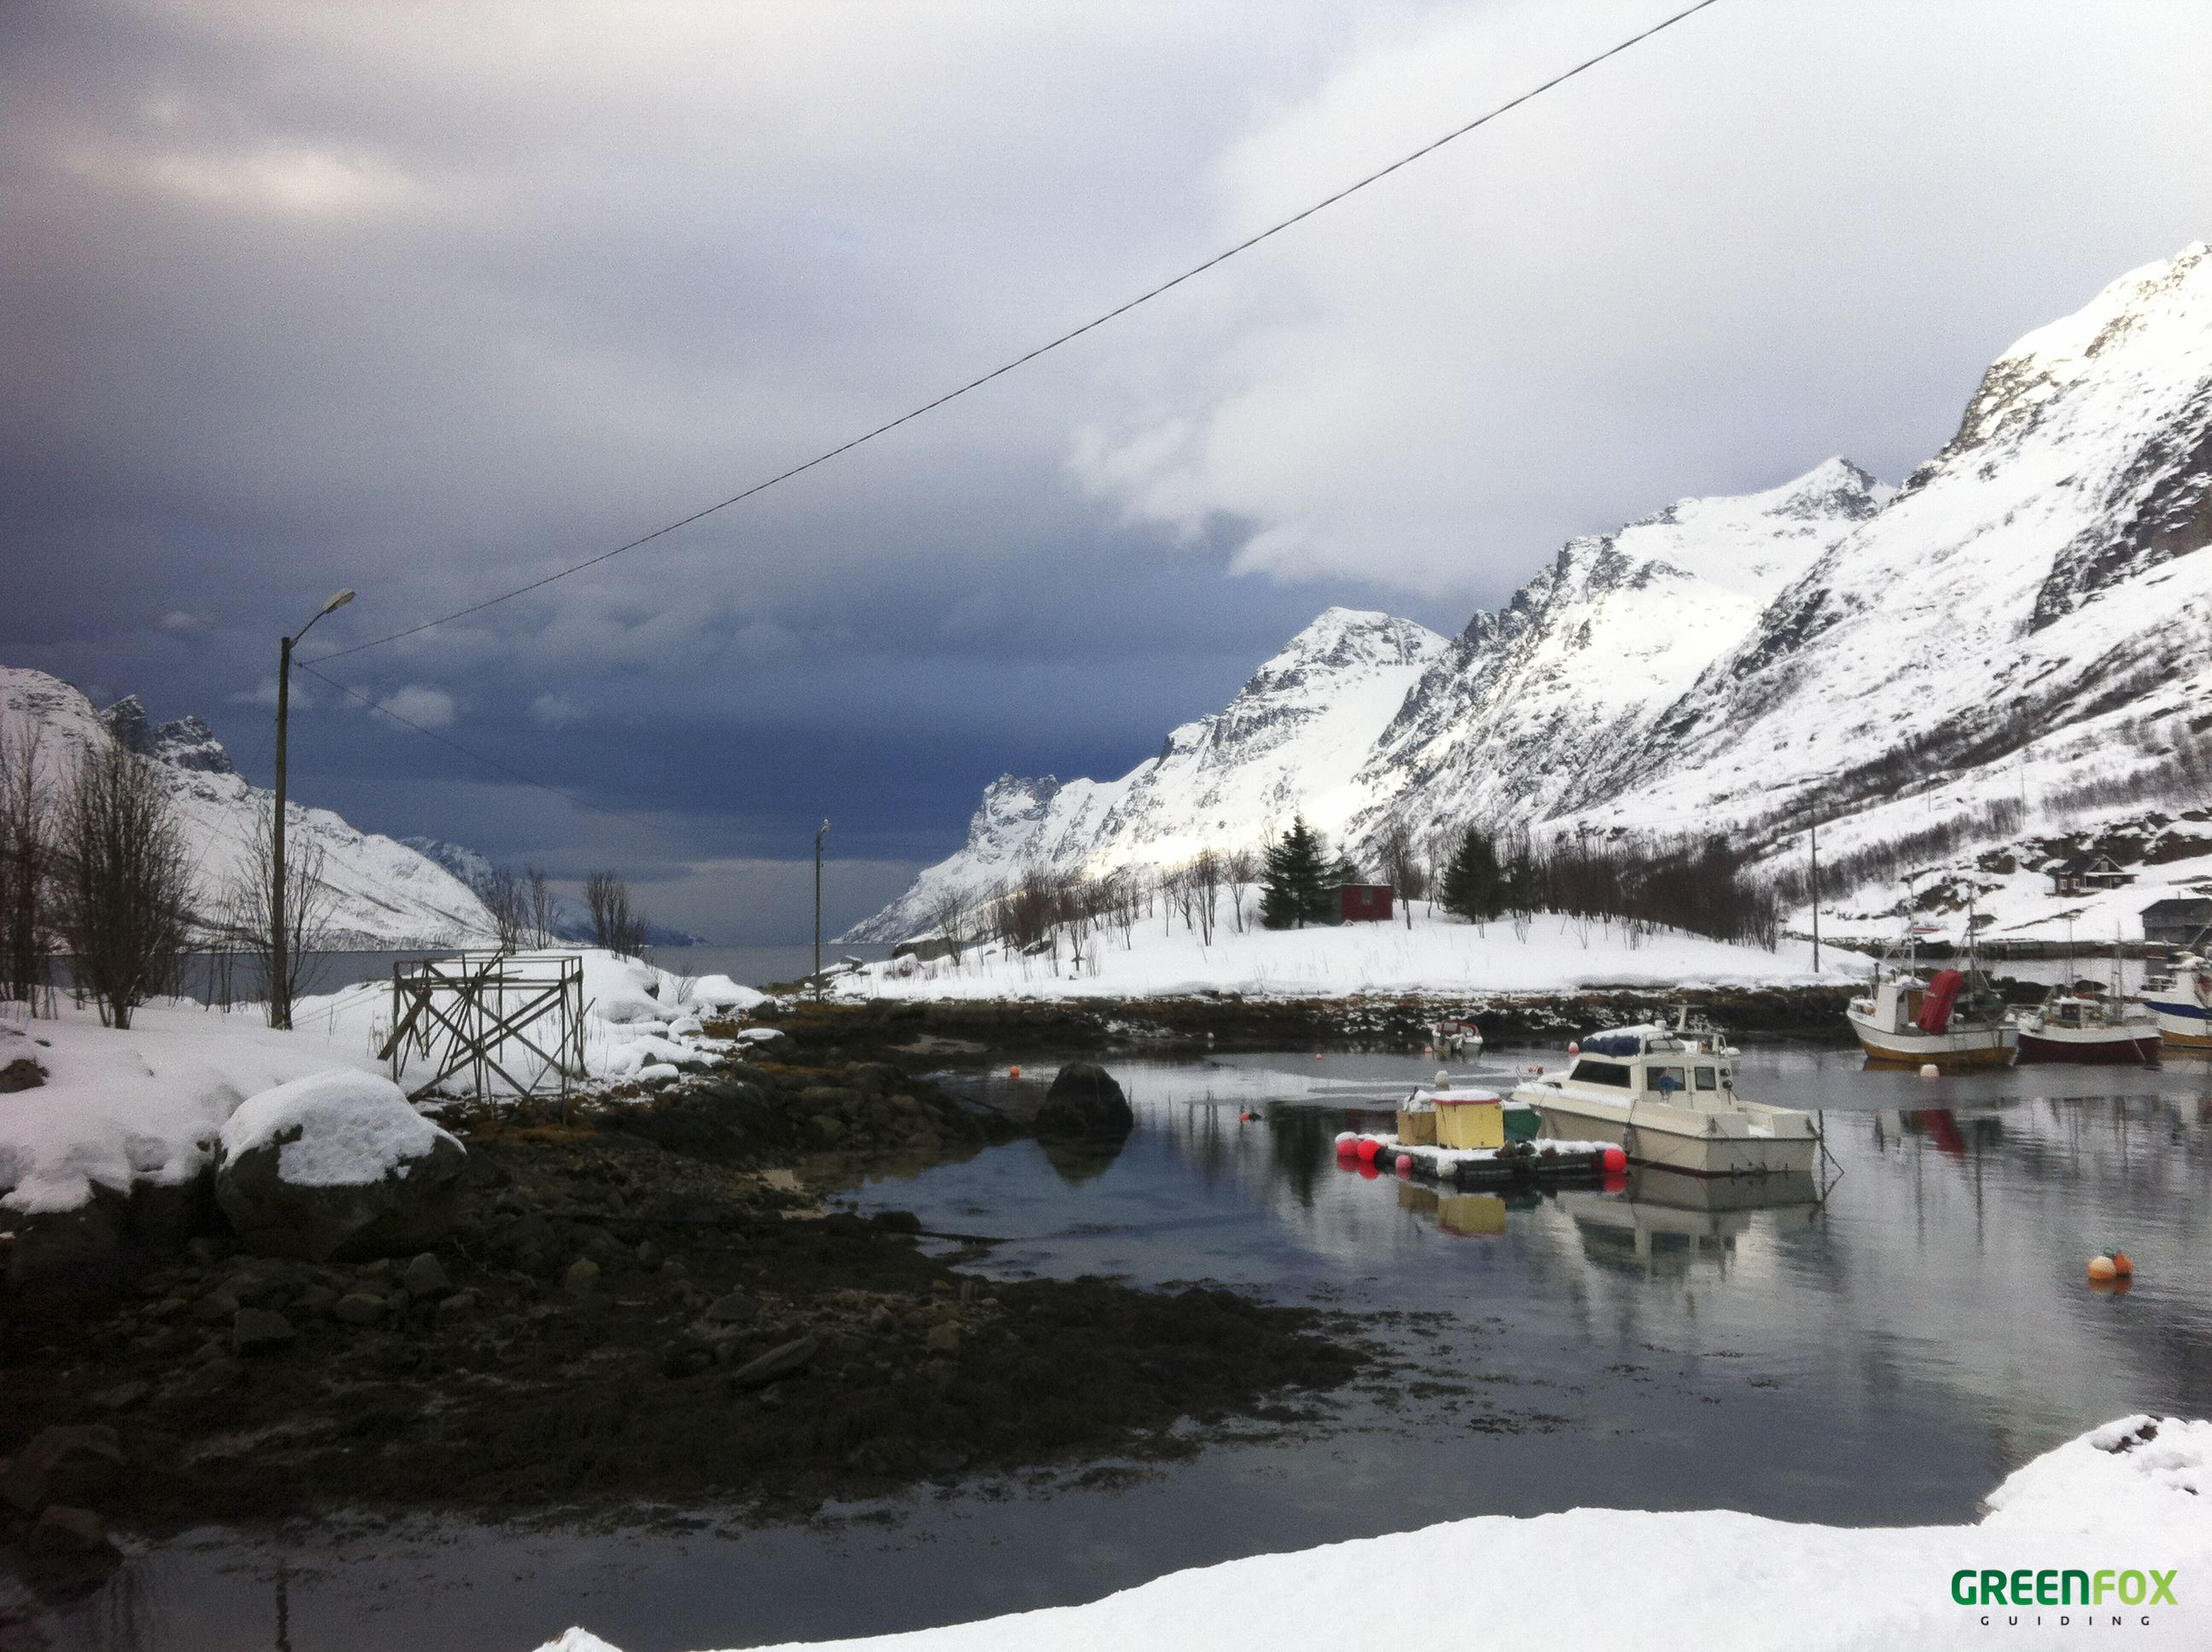 Fjord tour by car – Green Fox Guiding